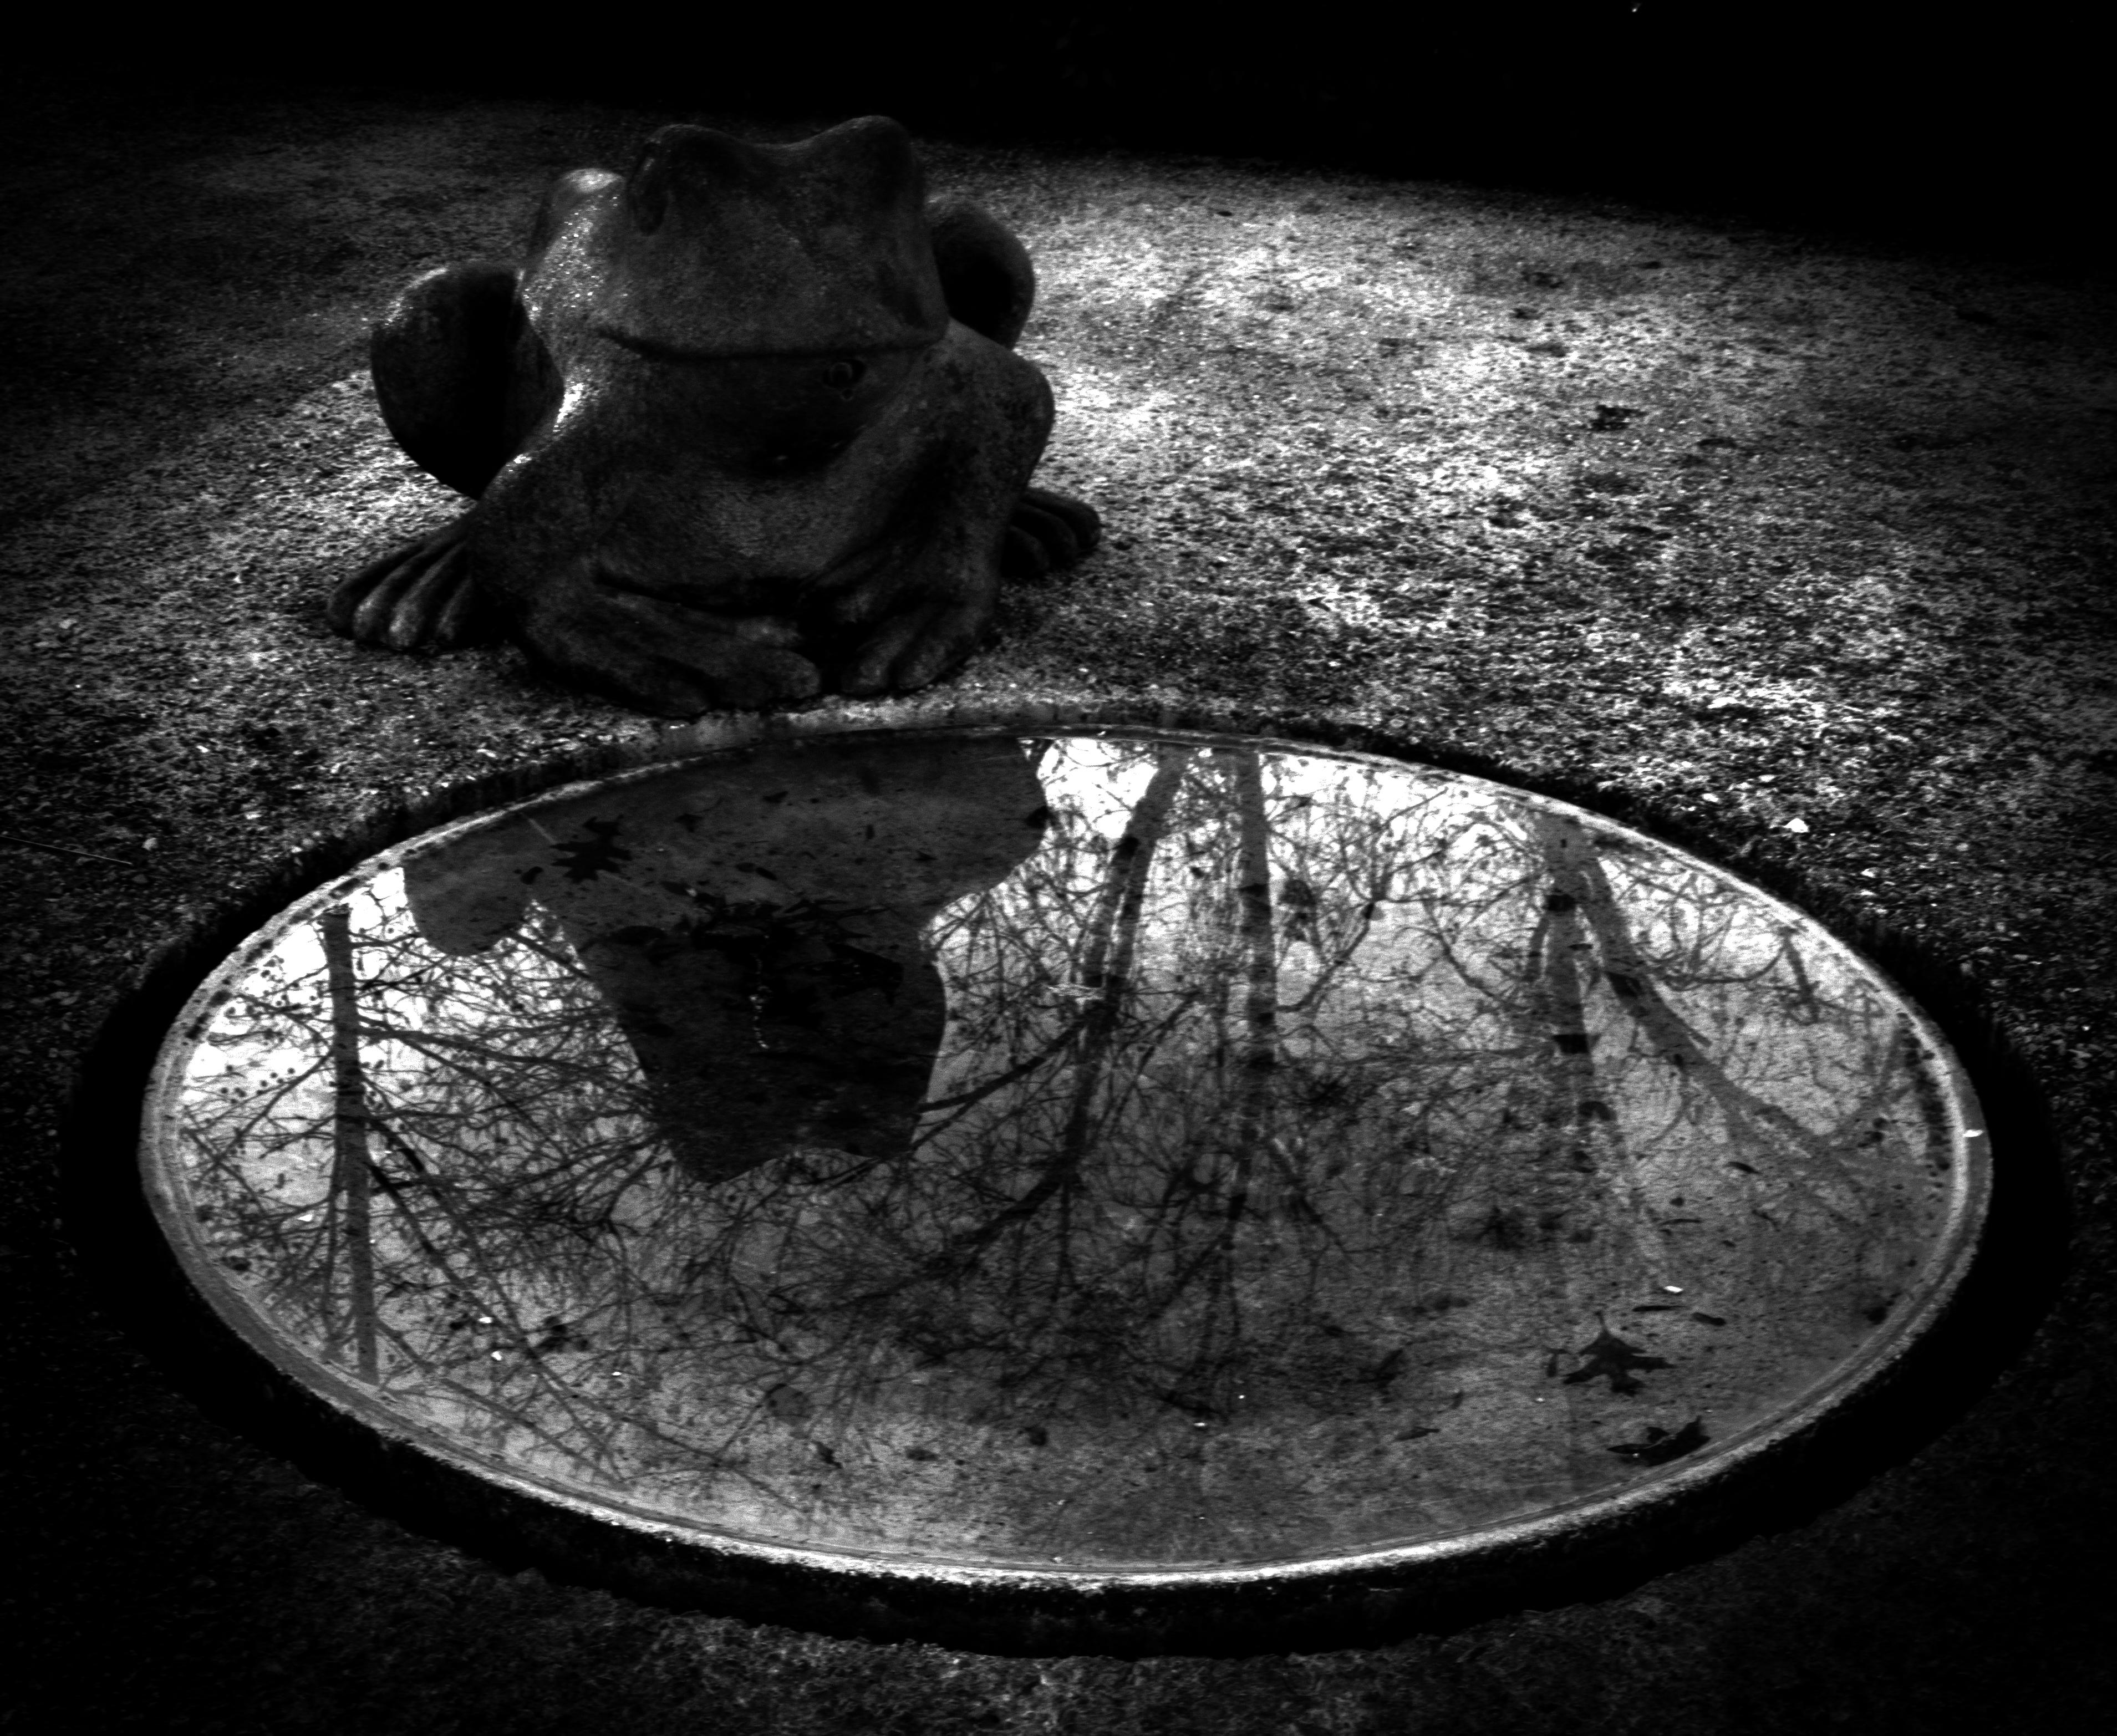 Wallpaper contrast night water reflection shadow moon grey